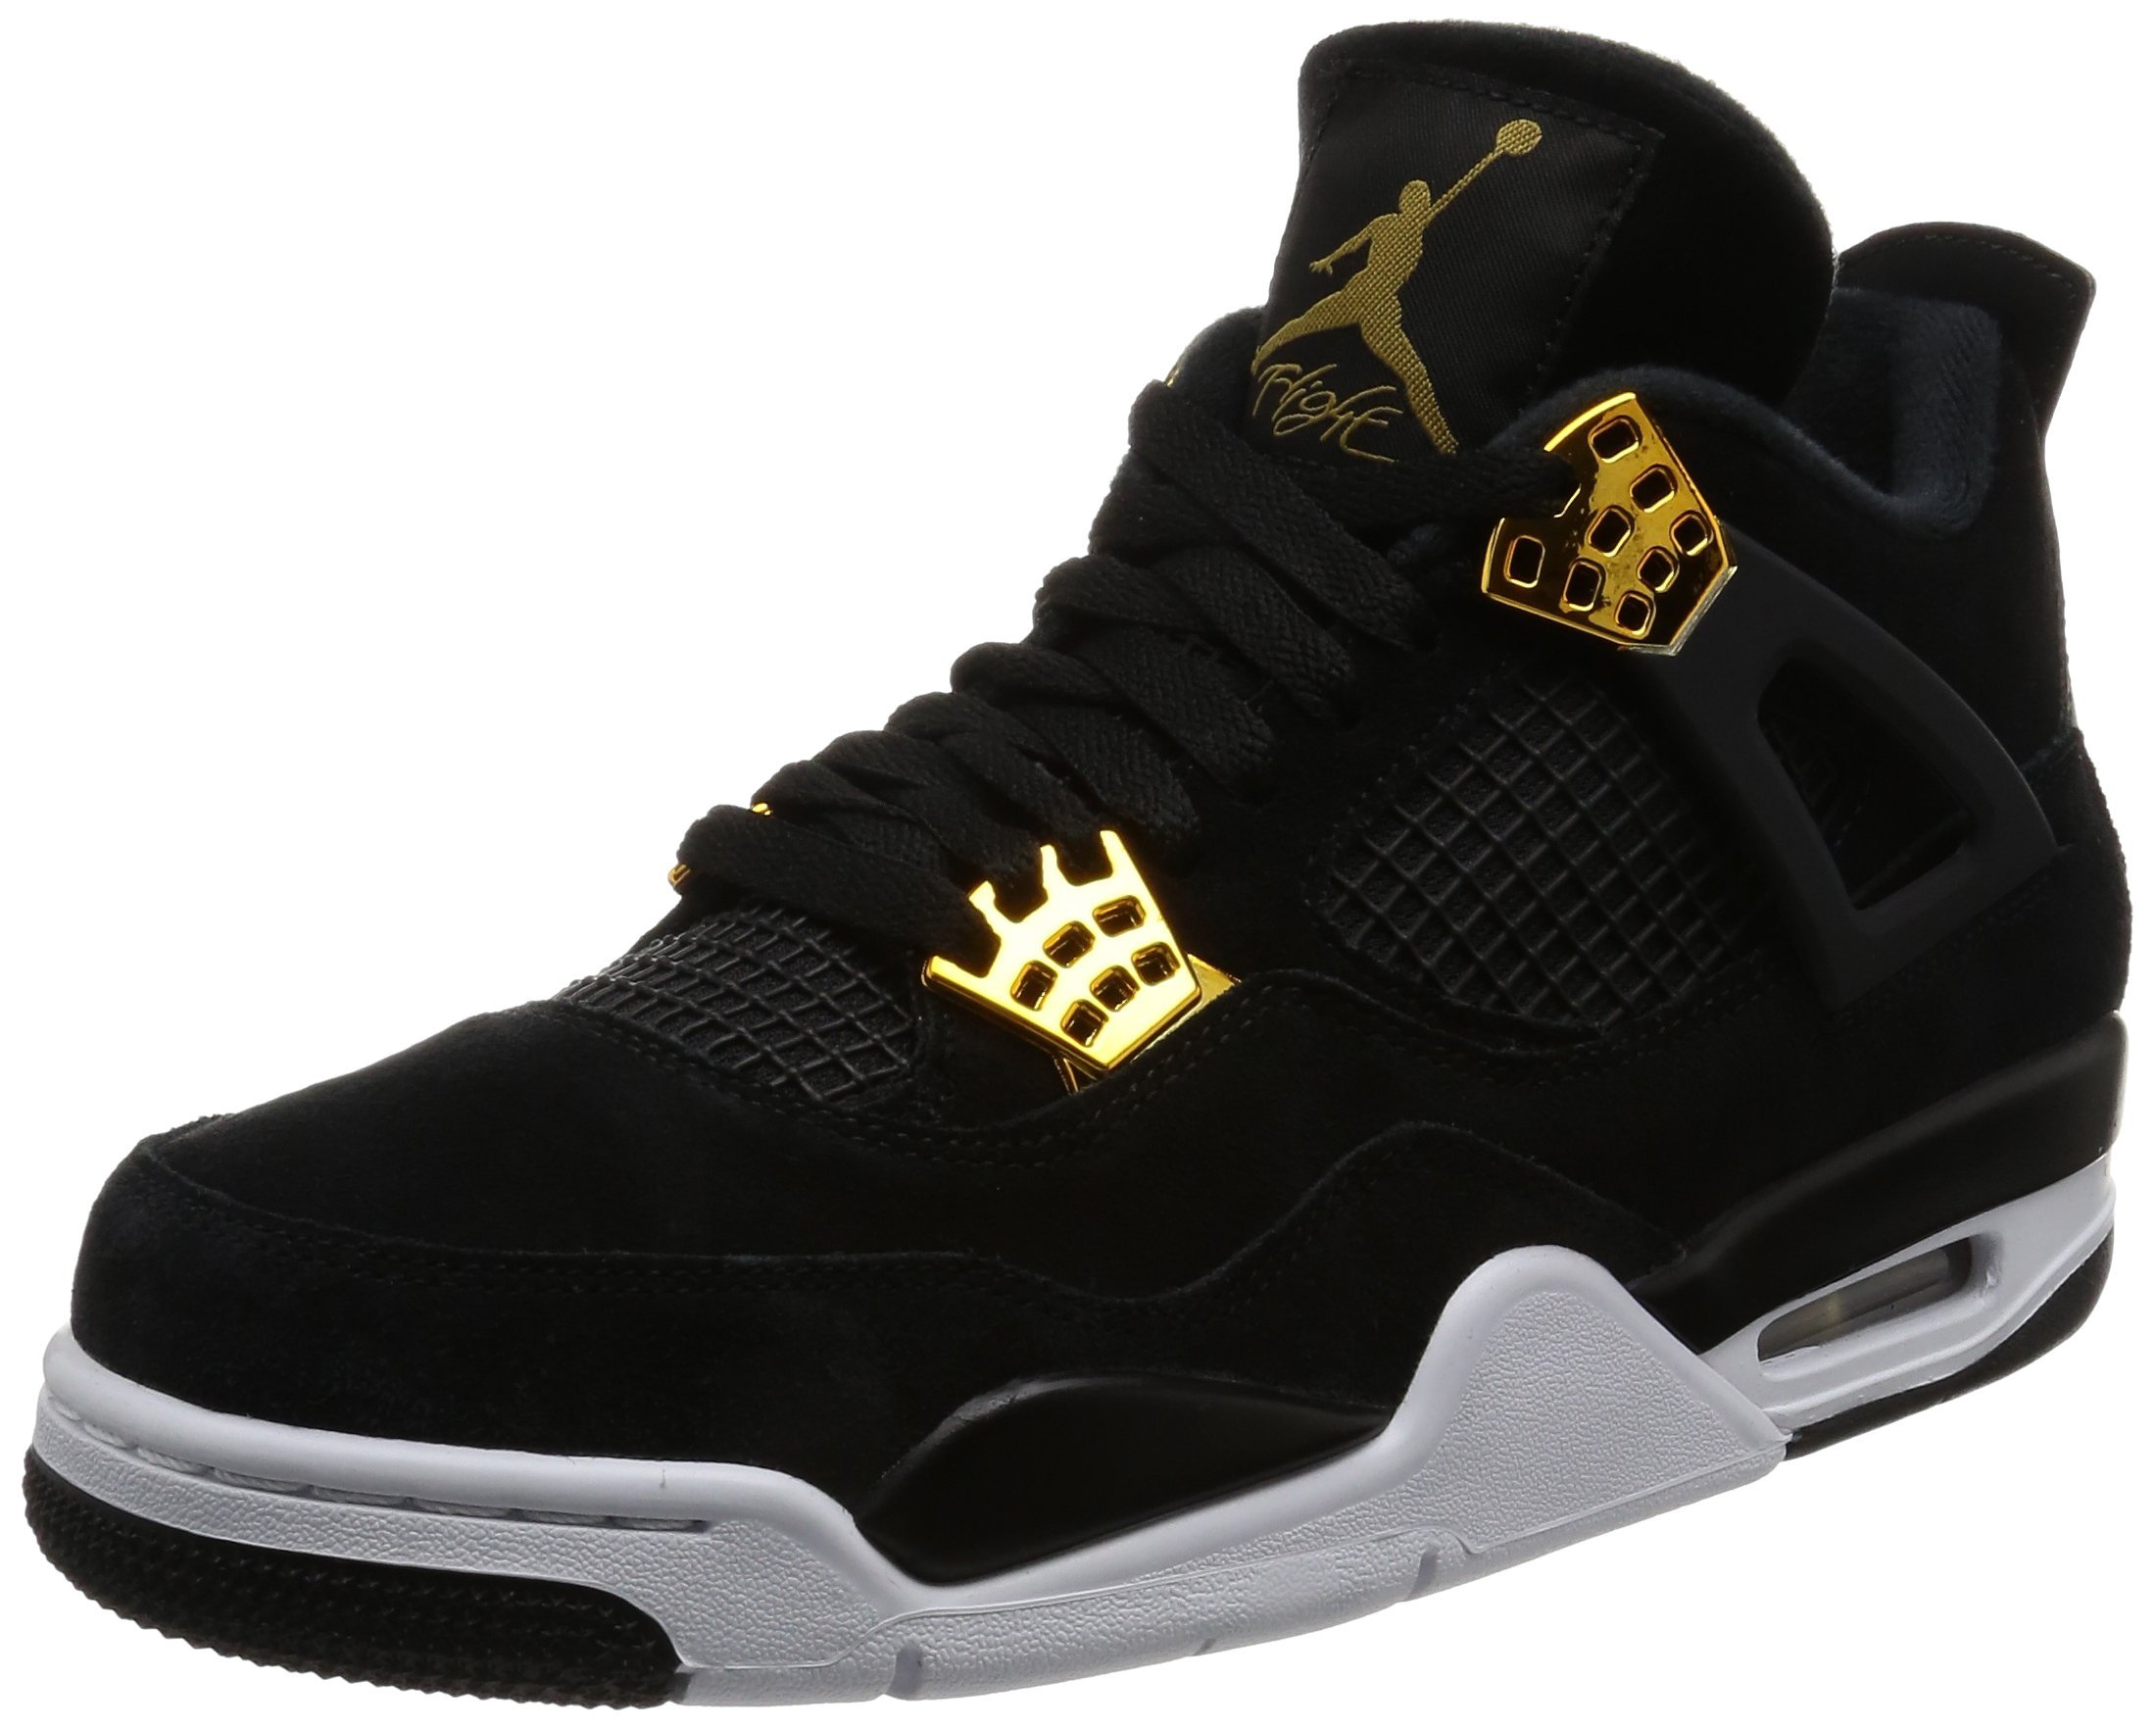 Nike Mens Air Jordan 4 Retro Black/Metallic Gold/White 308497-032 (SIZE: 11) by Jordan